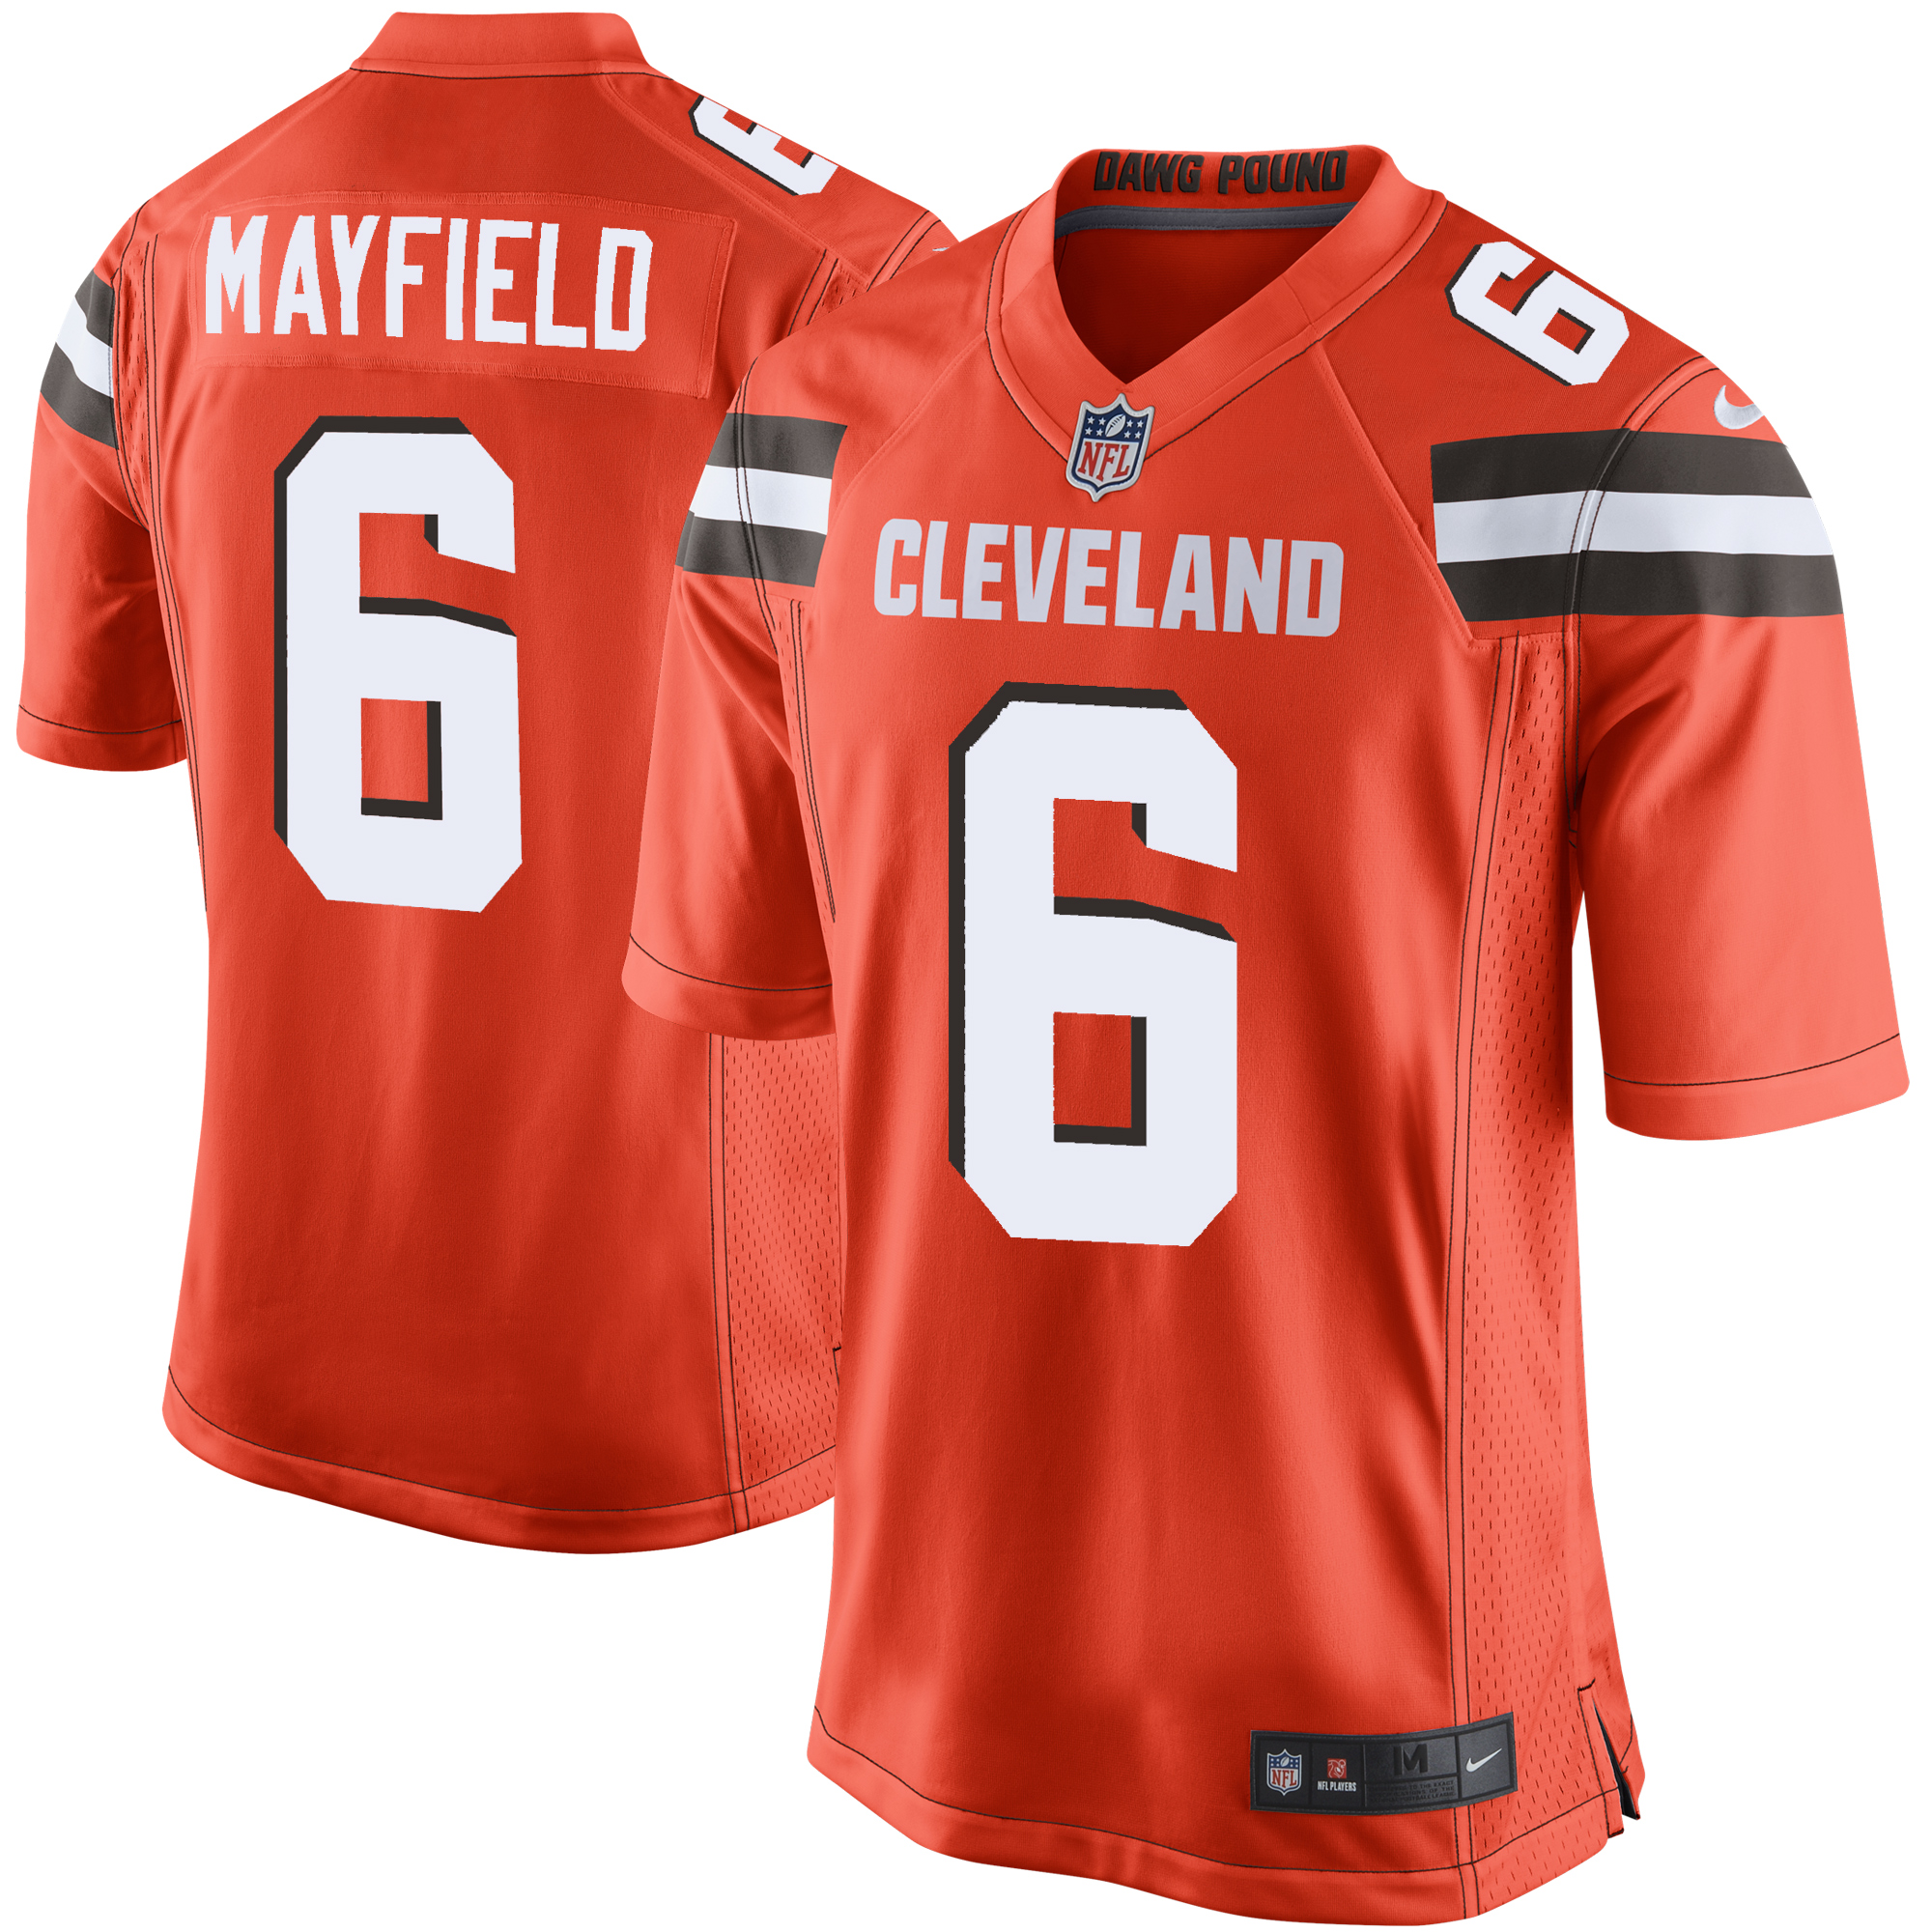 hot sale online 7f65a 5fc9e Baker Mayfield Cleveland Browns Nike Game Jersey - Orange